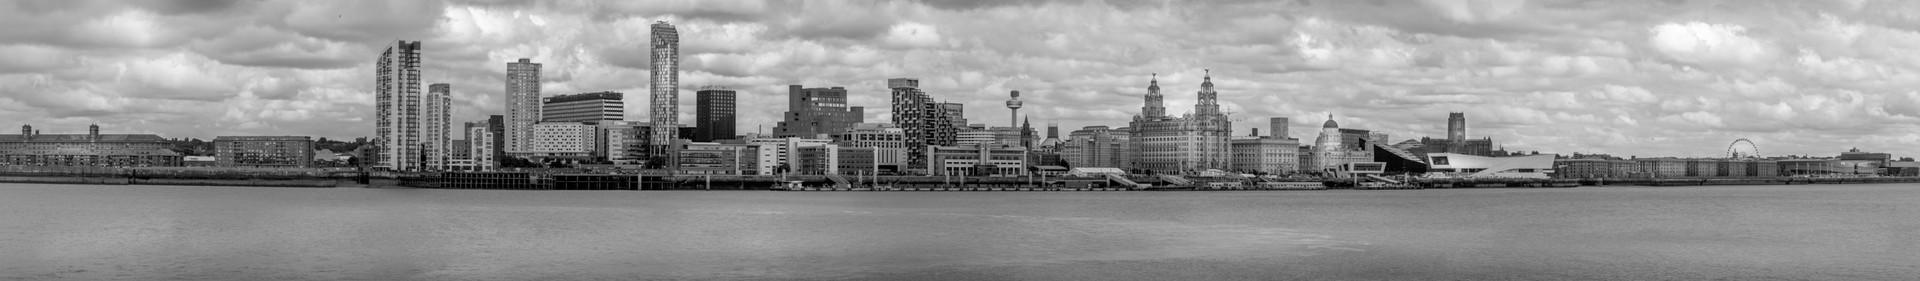 Liverpool Skyline from New Brighton